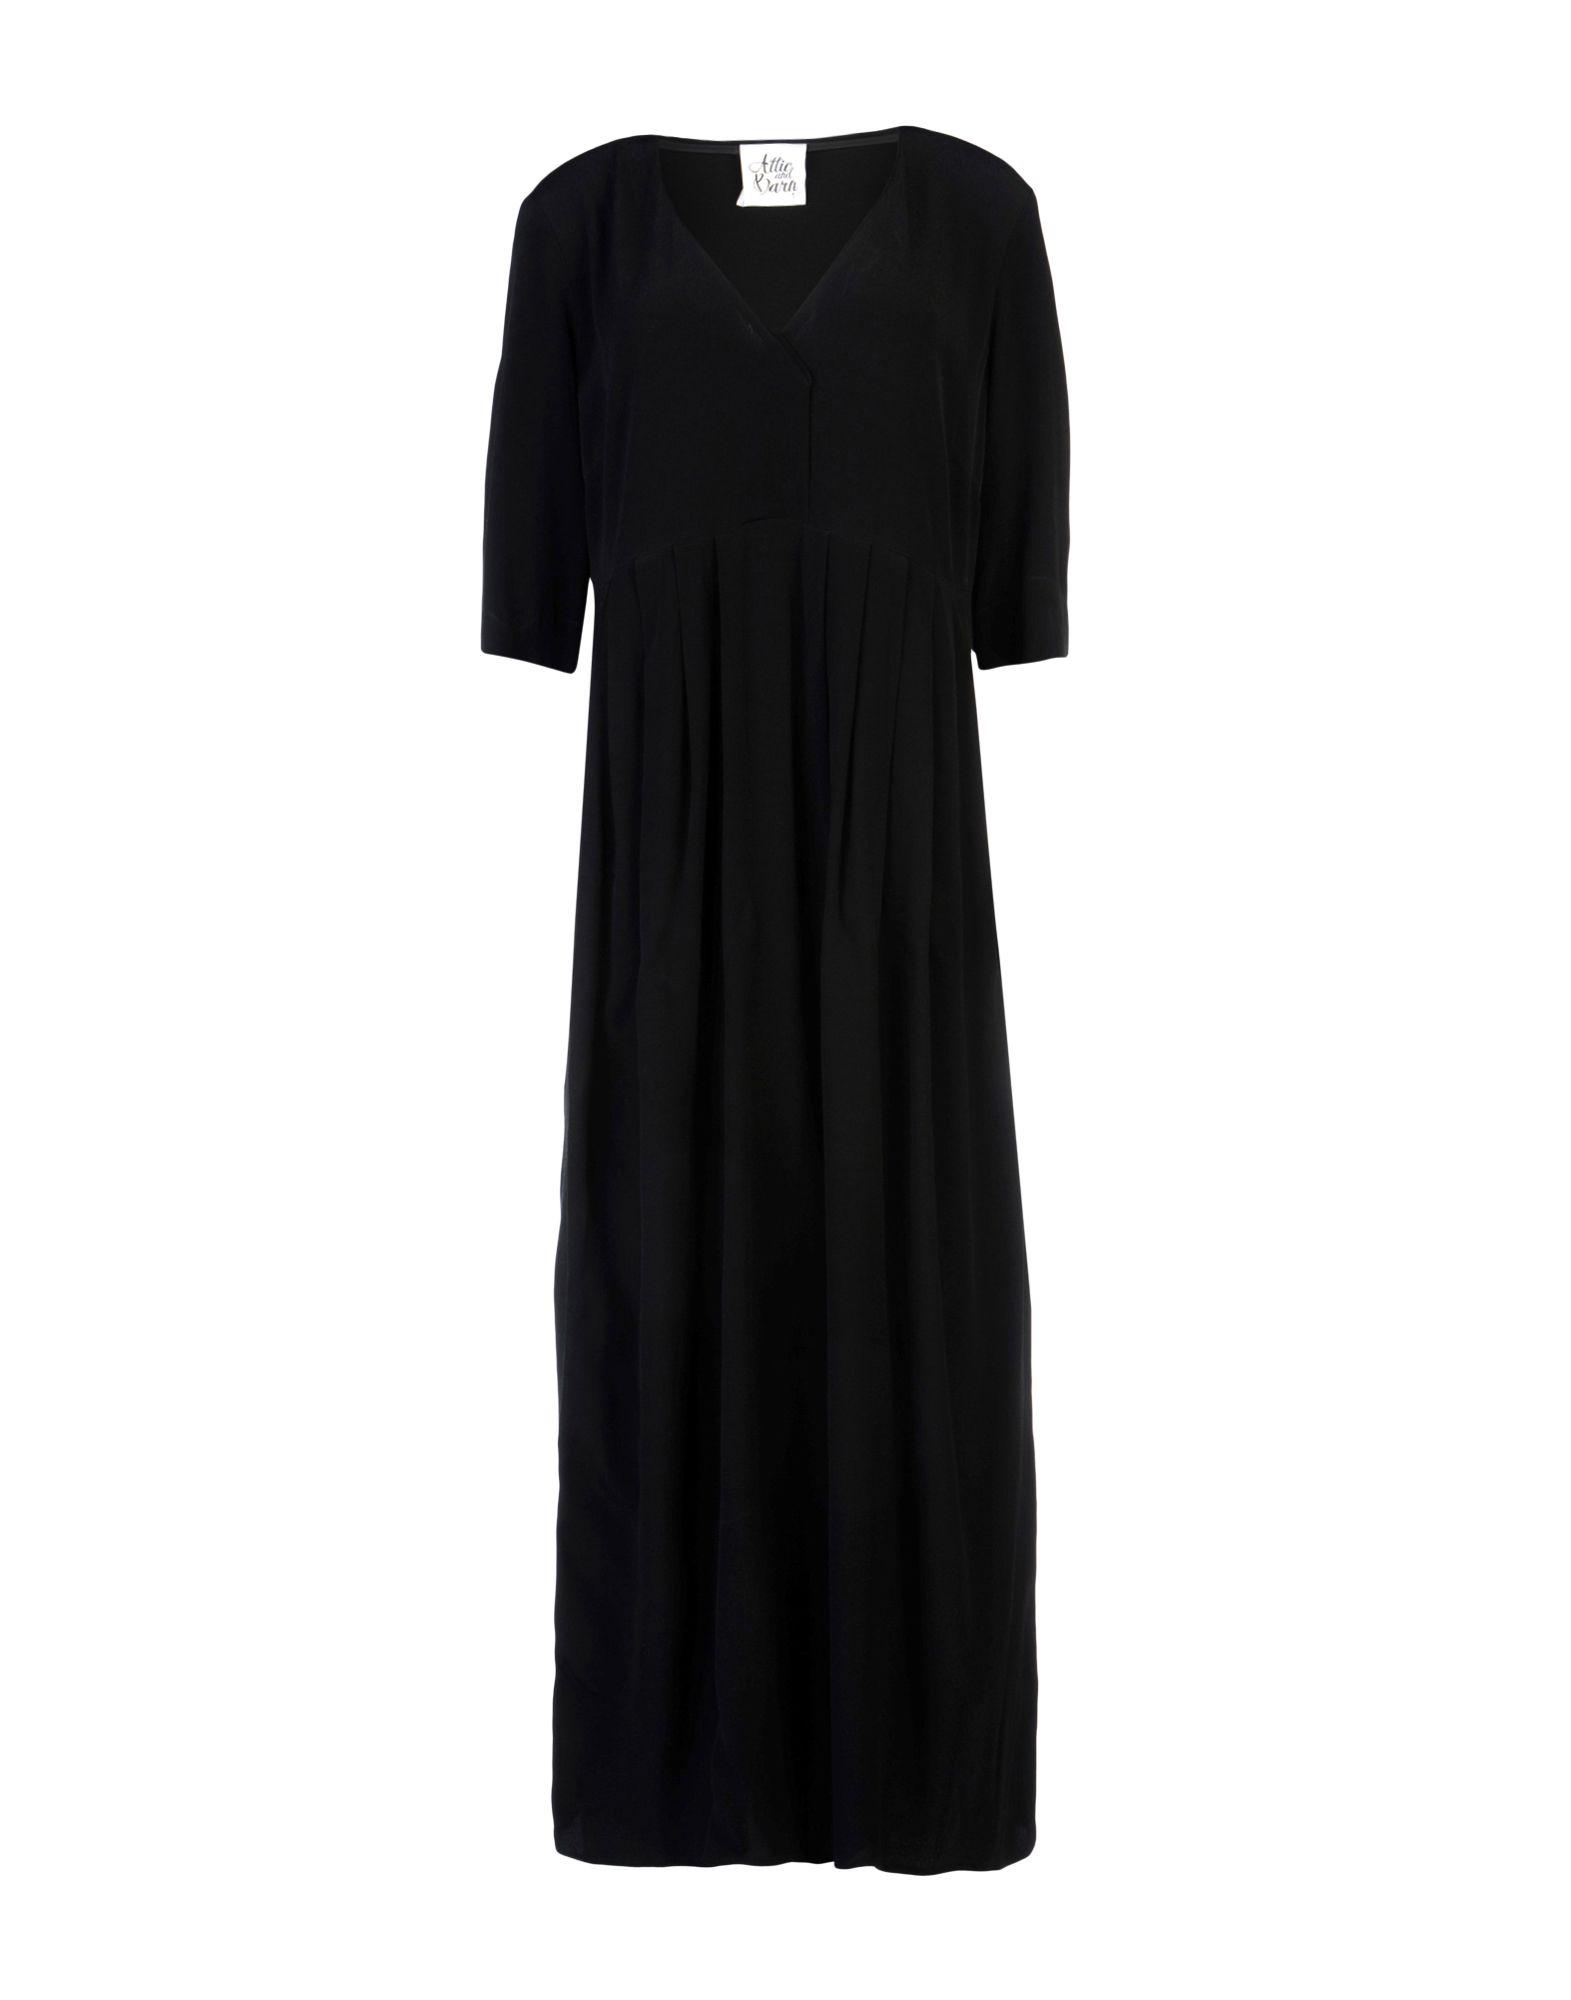 ATTIC AND BARN Платье длиной 3/4 lisa corti платье длиной 3 4